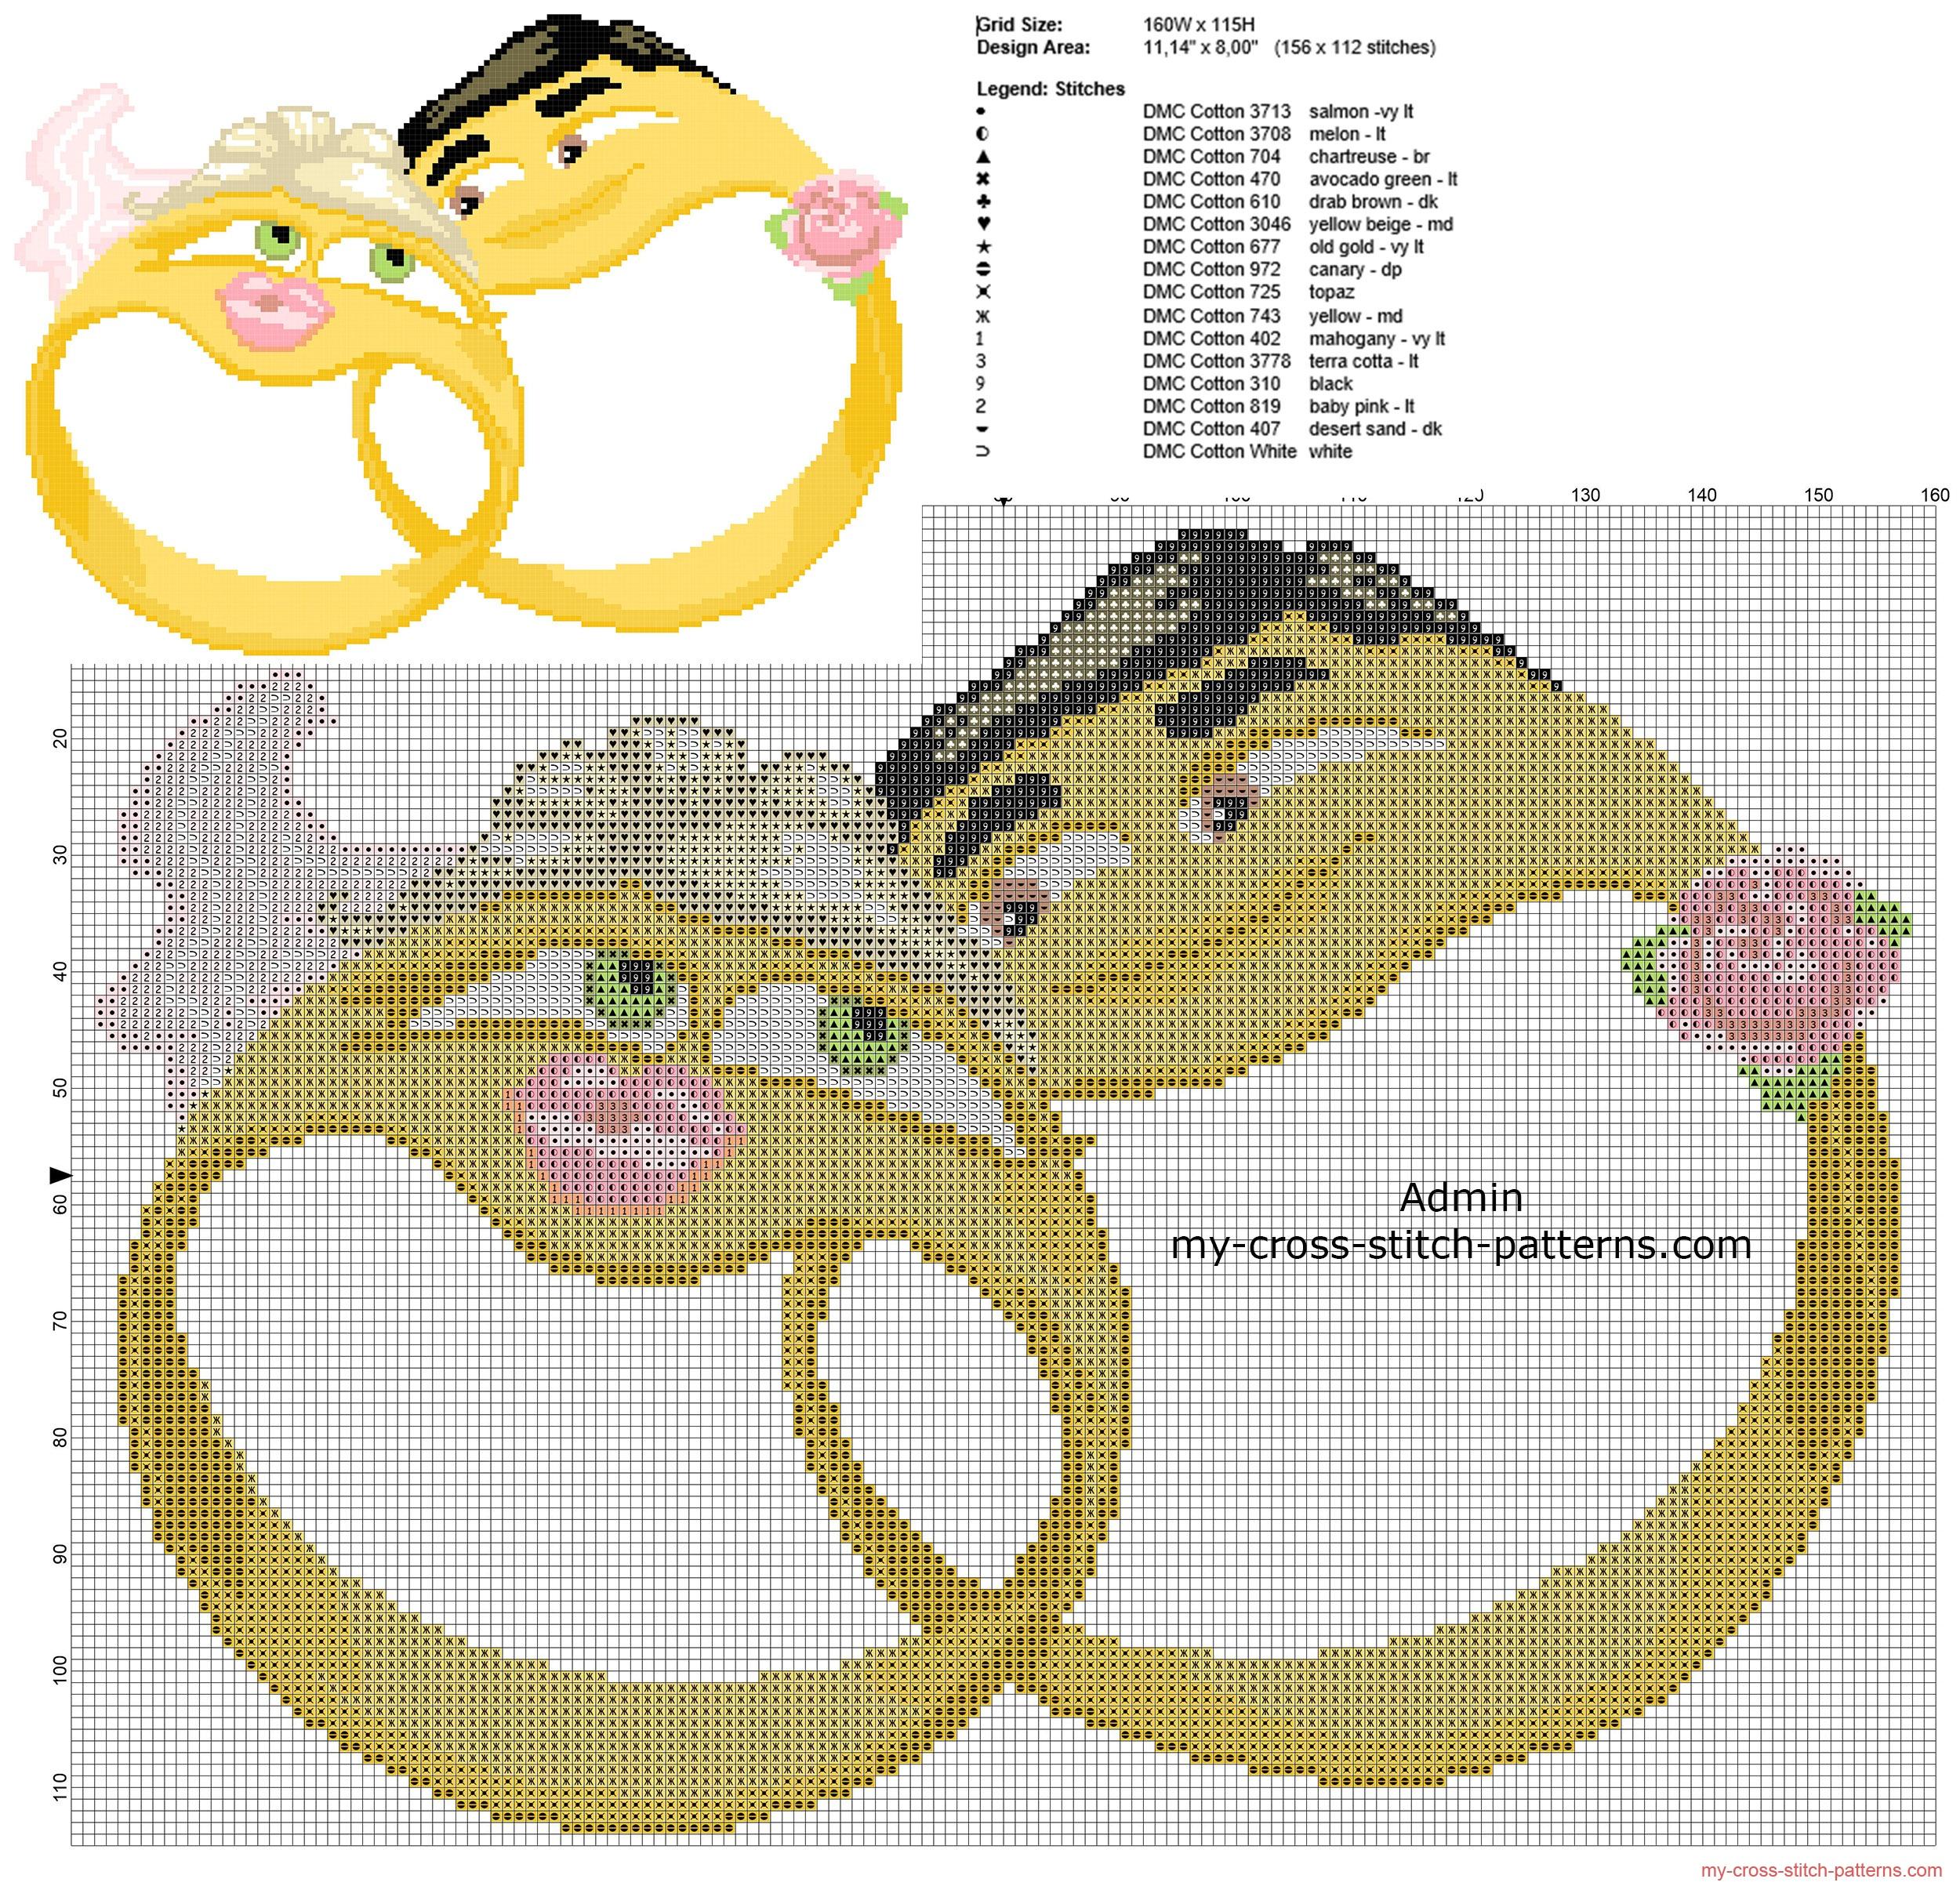 anniversary_cross_stitch_pattern_two_wedding_rings_emoticons